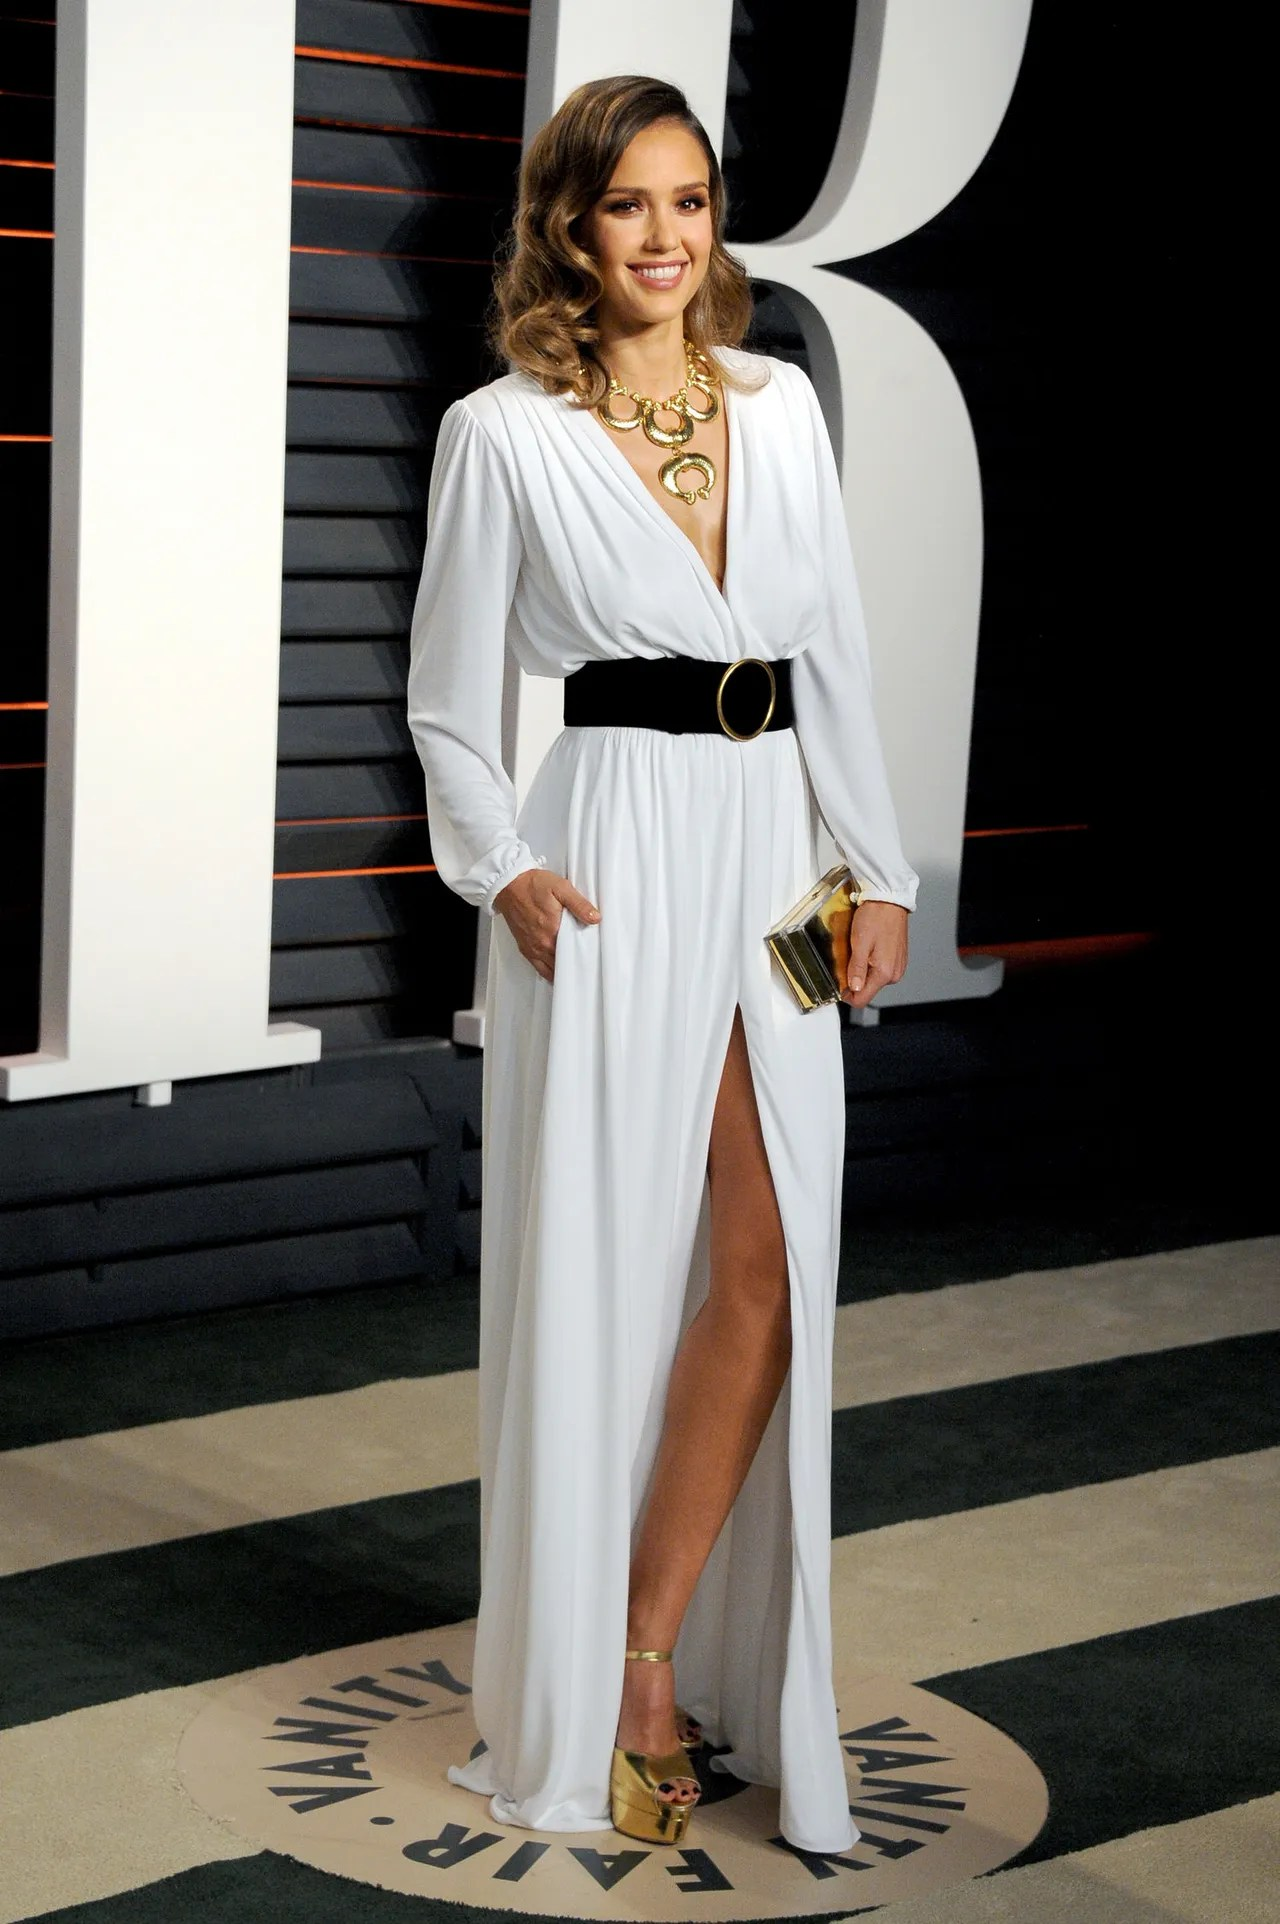 Sophisticated Vanity Fair Oscars Party 2016 Jessica Alba Roberto Cavalli Oscar Red Carpet Dresses You Oscar Knock Off Dresses 2016 10 Oscar Dresses 2016 wedding dress Oscar Dresses 2016